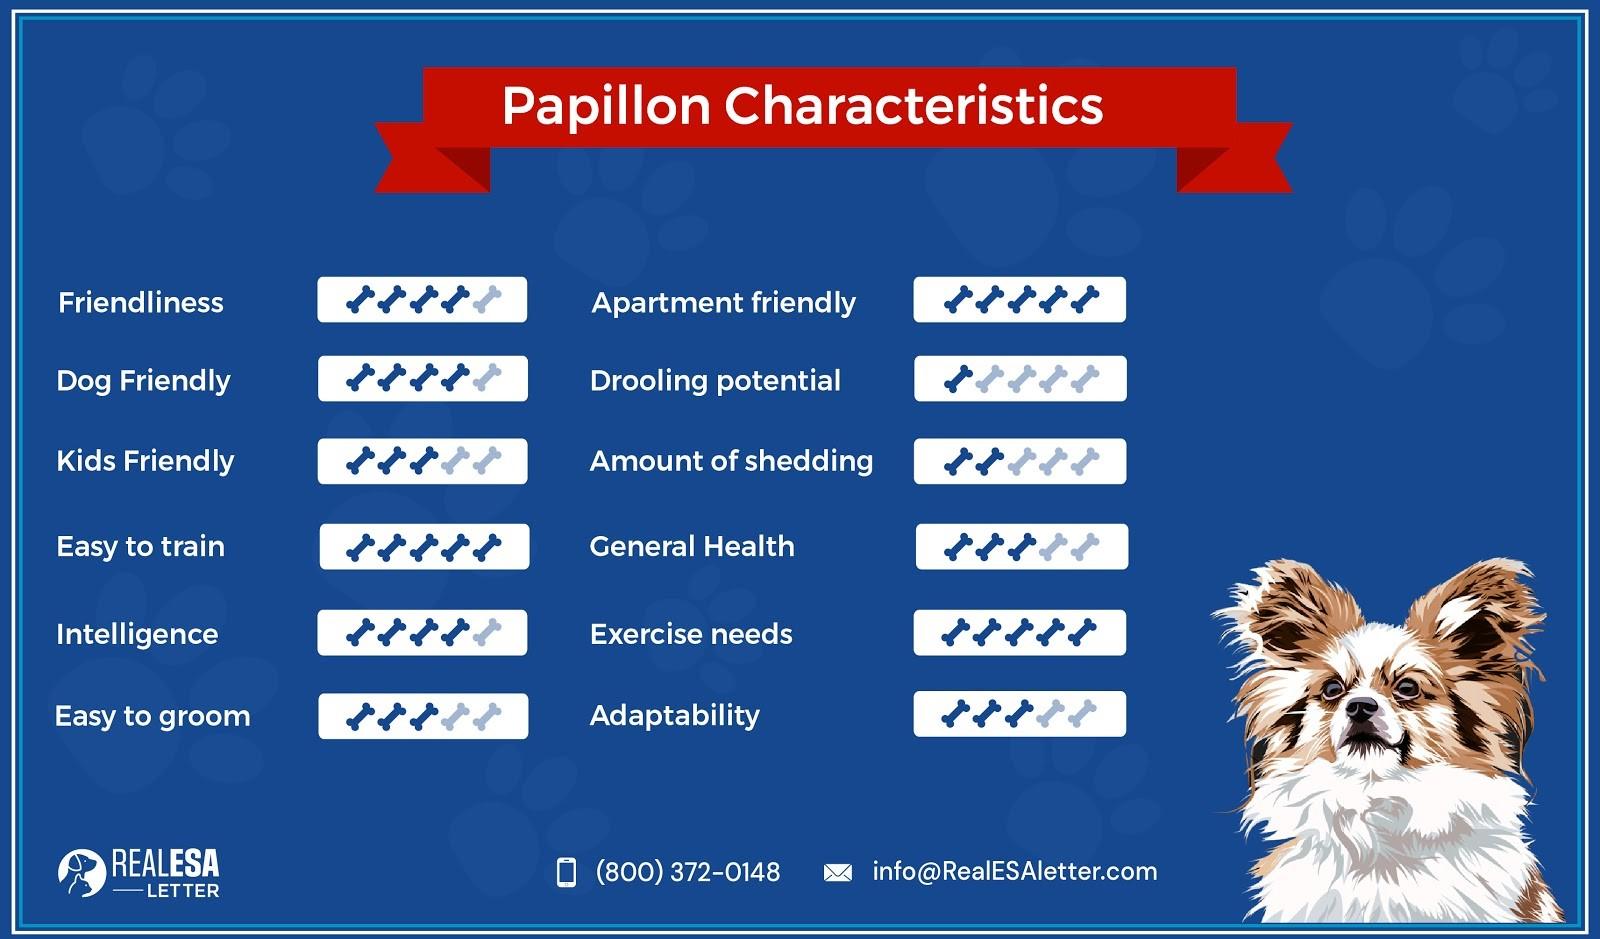 papillon dog characteristics